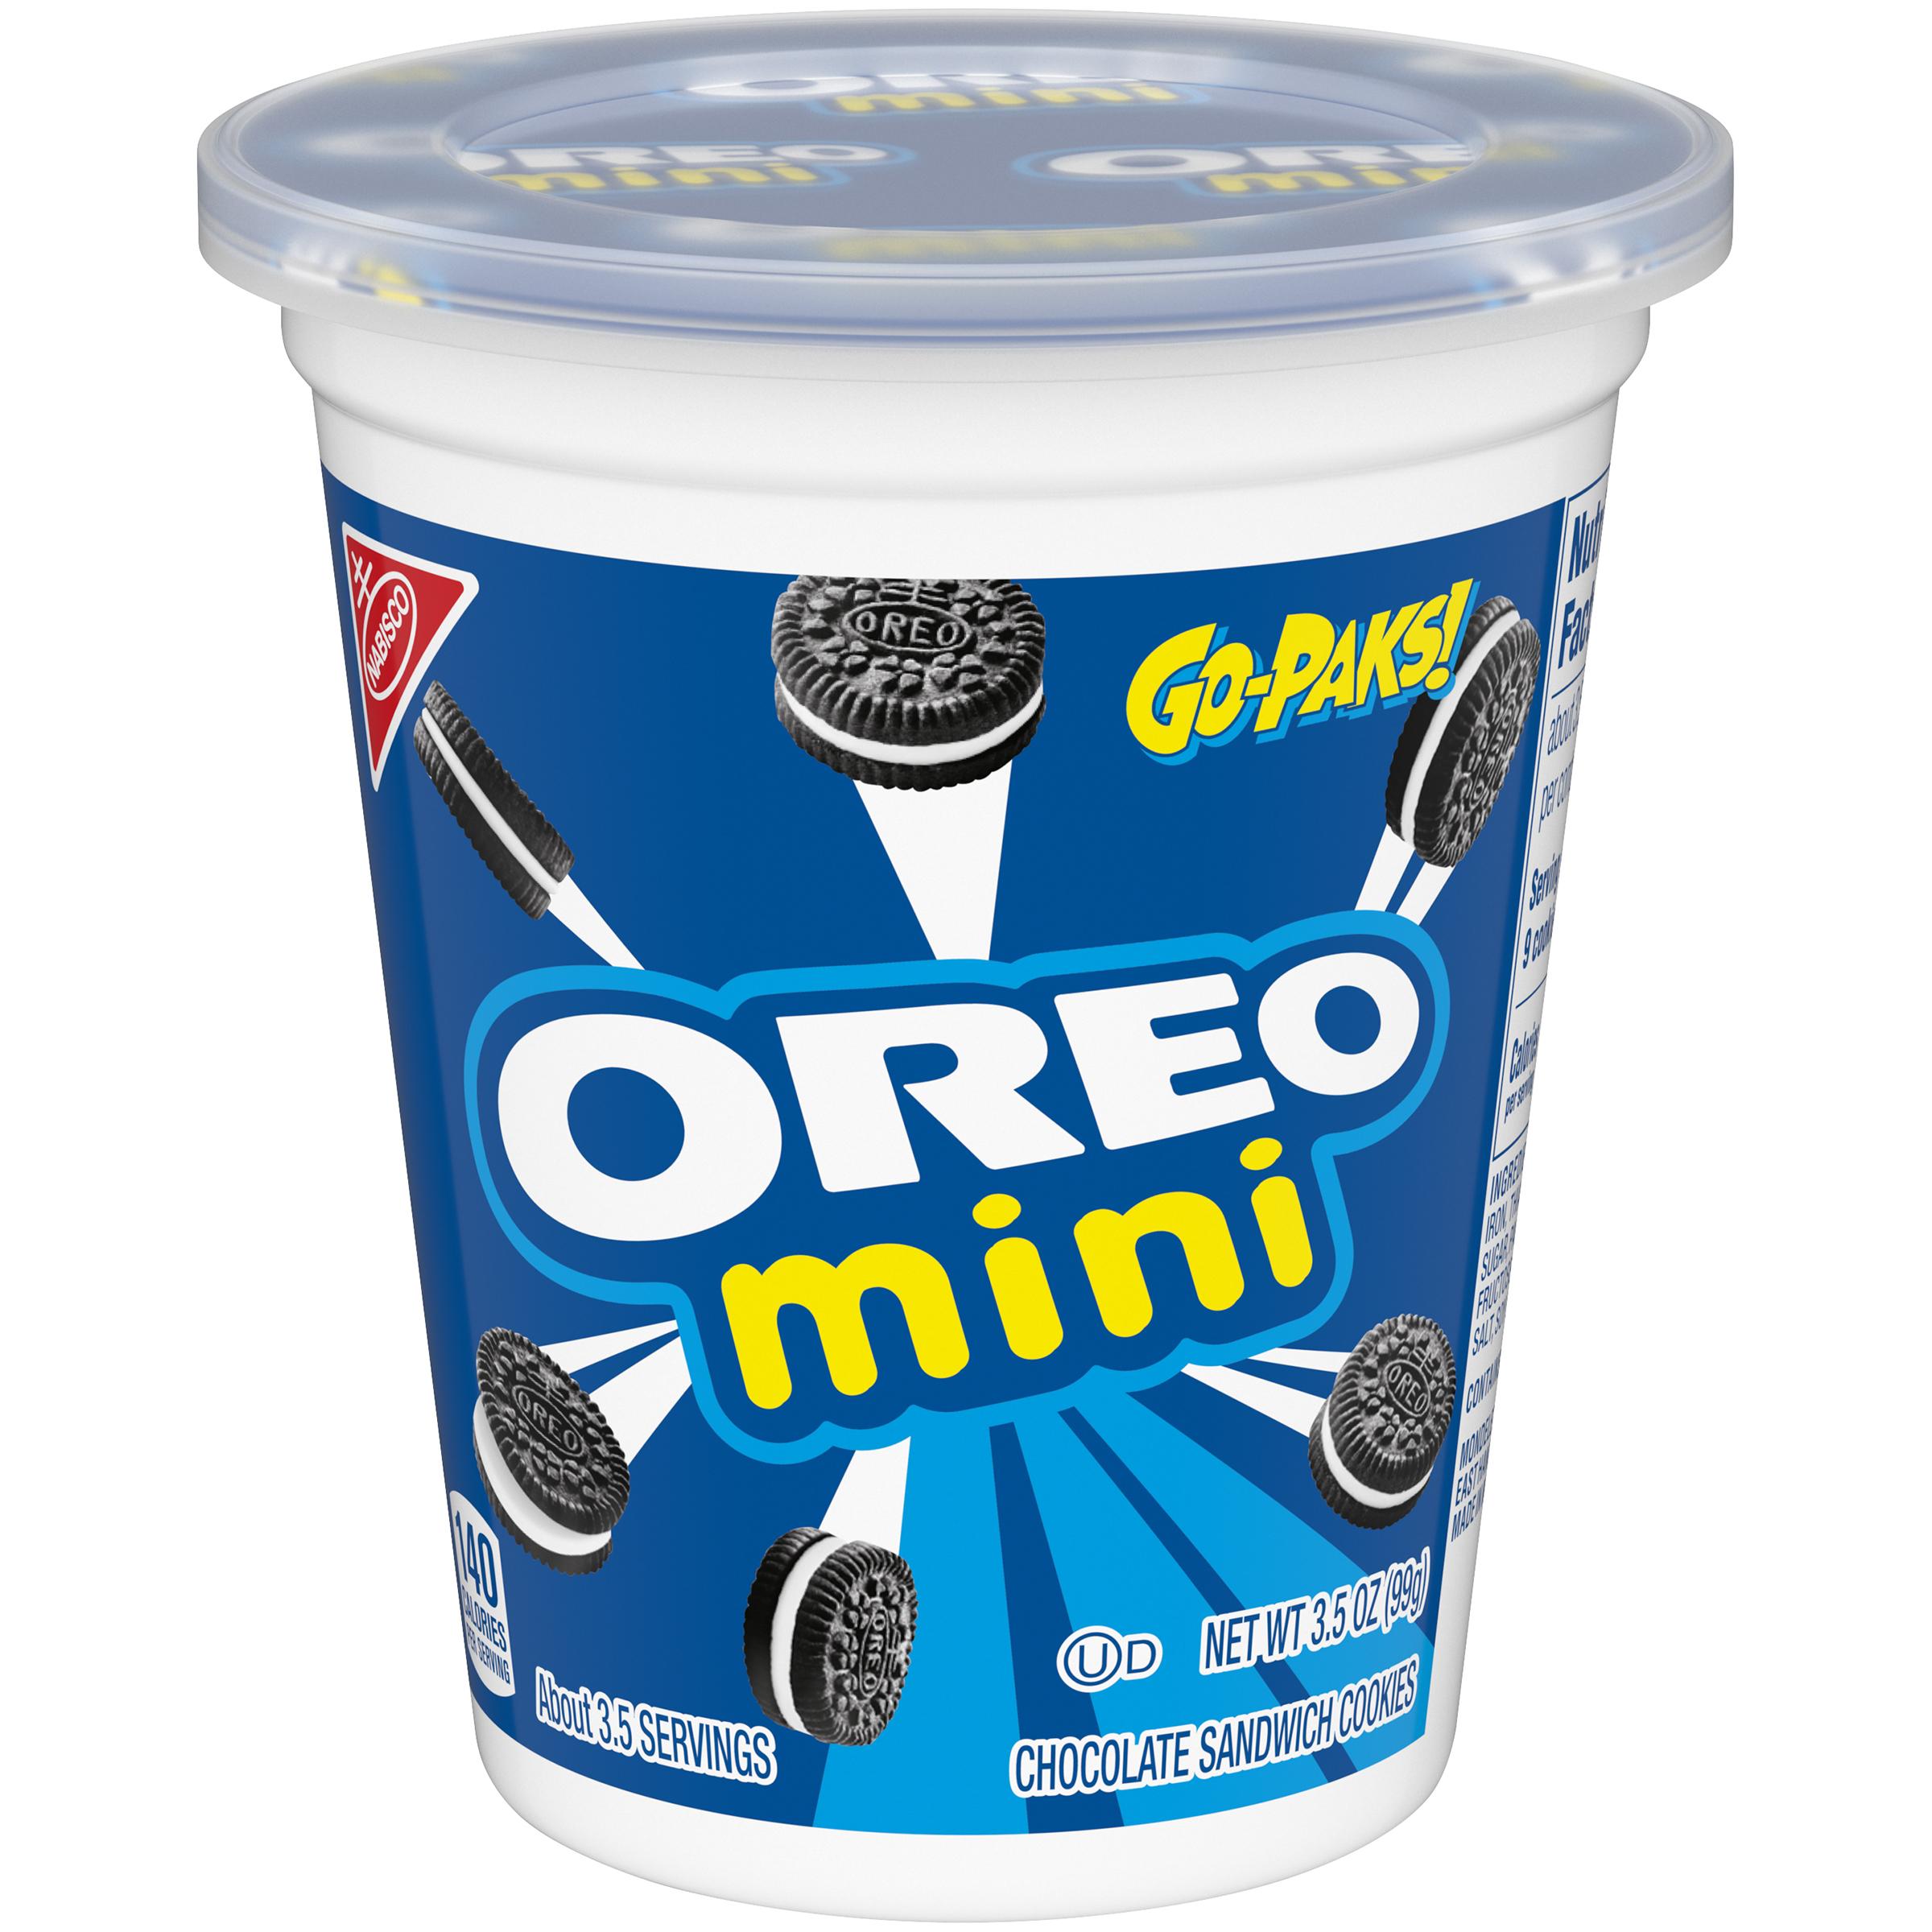 OREO Mini Go-Paks Cookies - Mini 3.5 oz